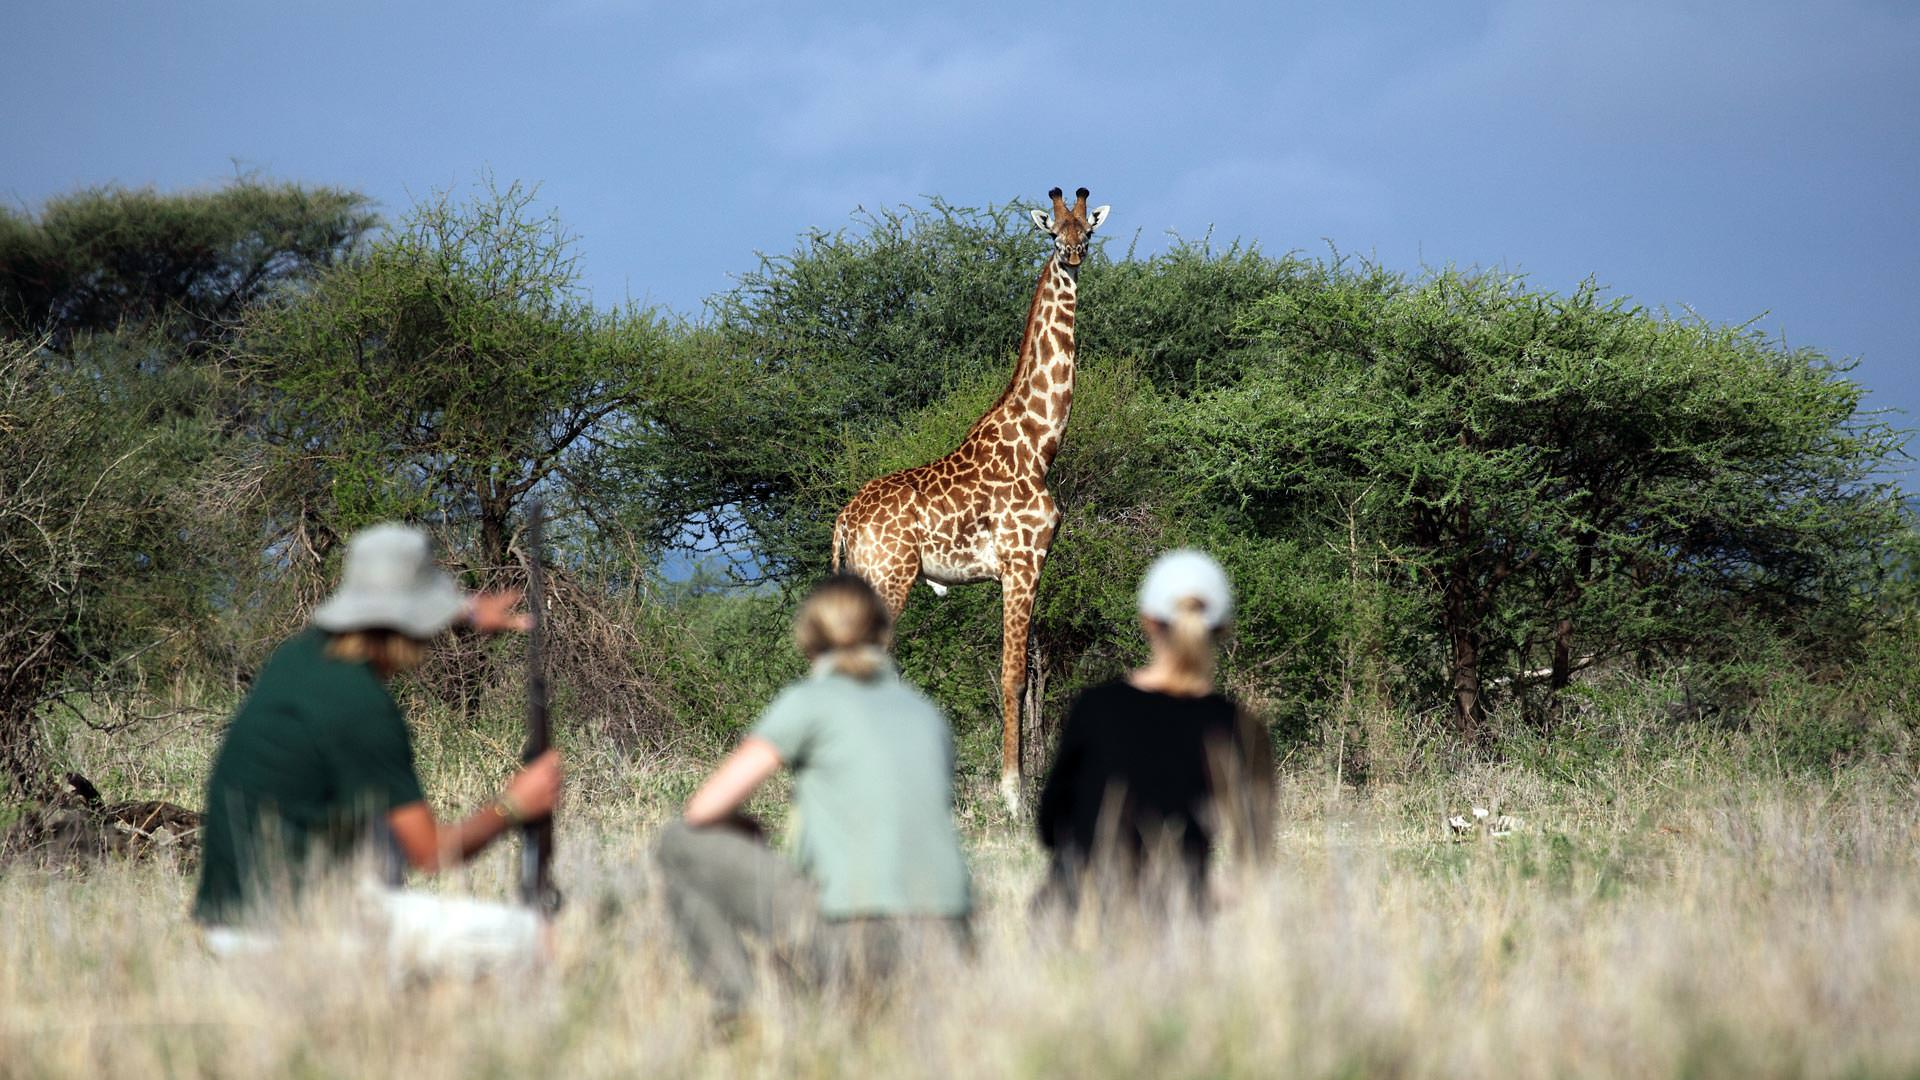 Approaching giraffe on foot at Manyara Ranch Conservancy